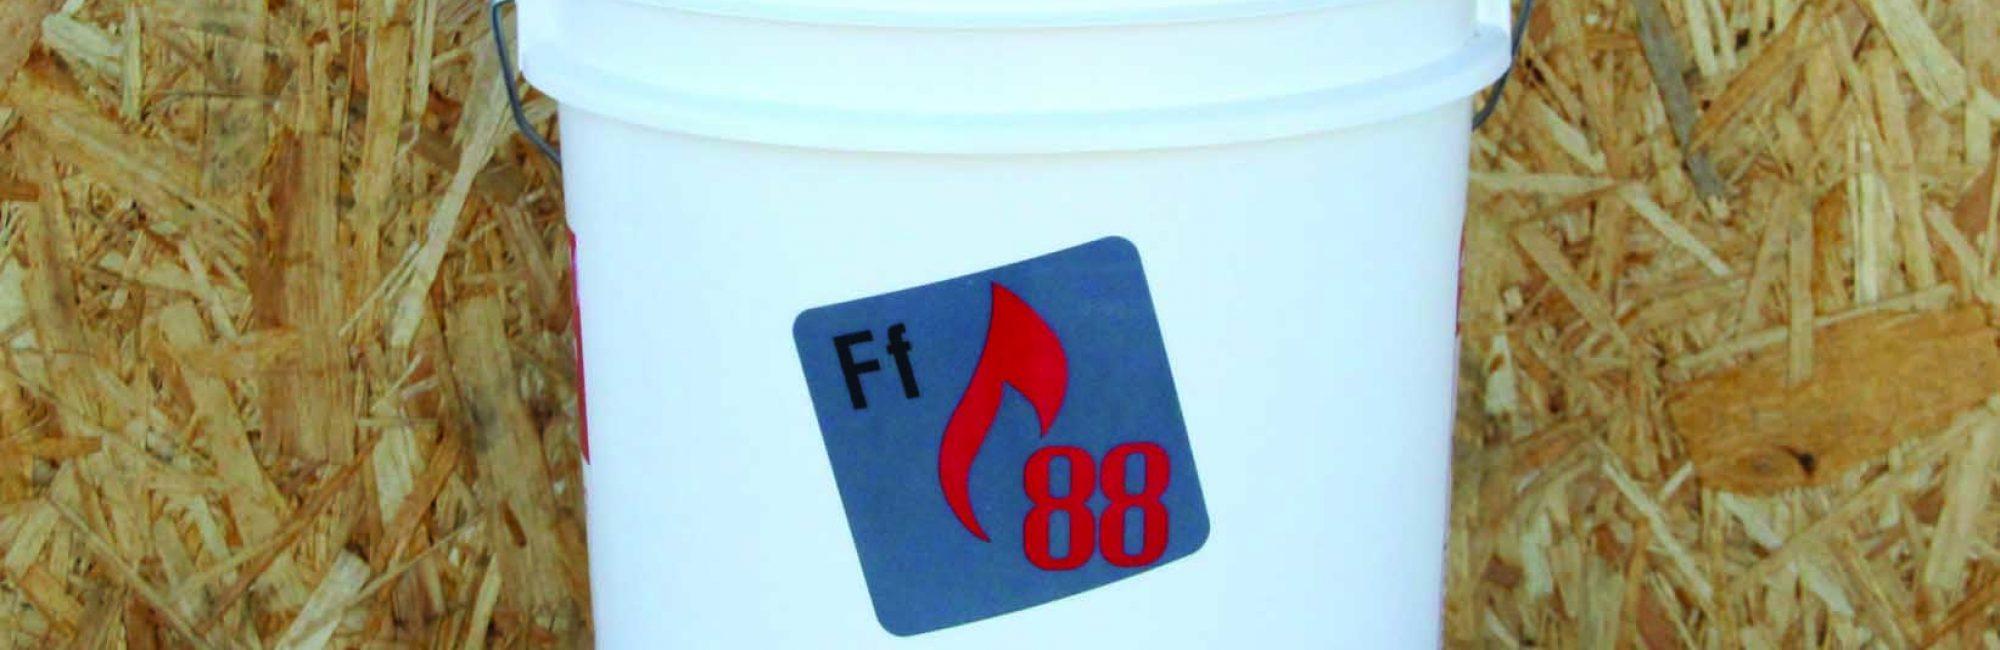 image alt=ff88